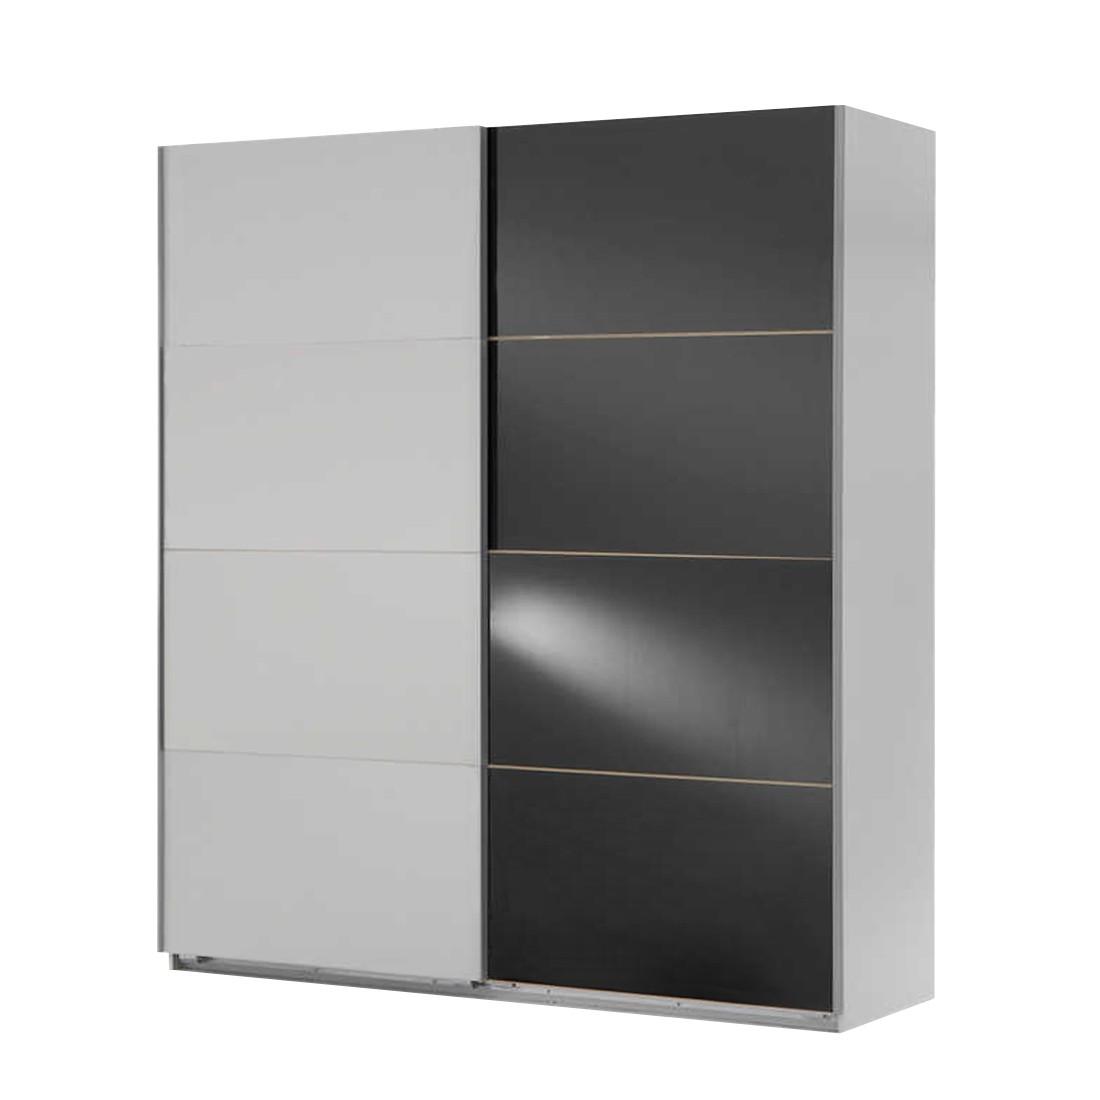 schwebet renschrank kingston c alpinwei grauglas. Black Bedroom Furniture Sets. Home Design Ideas